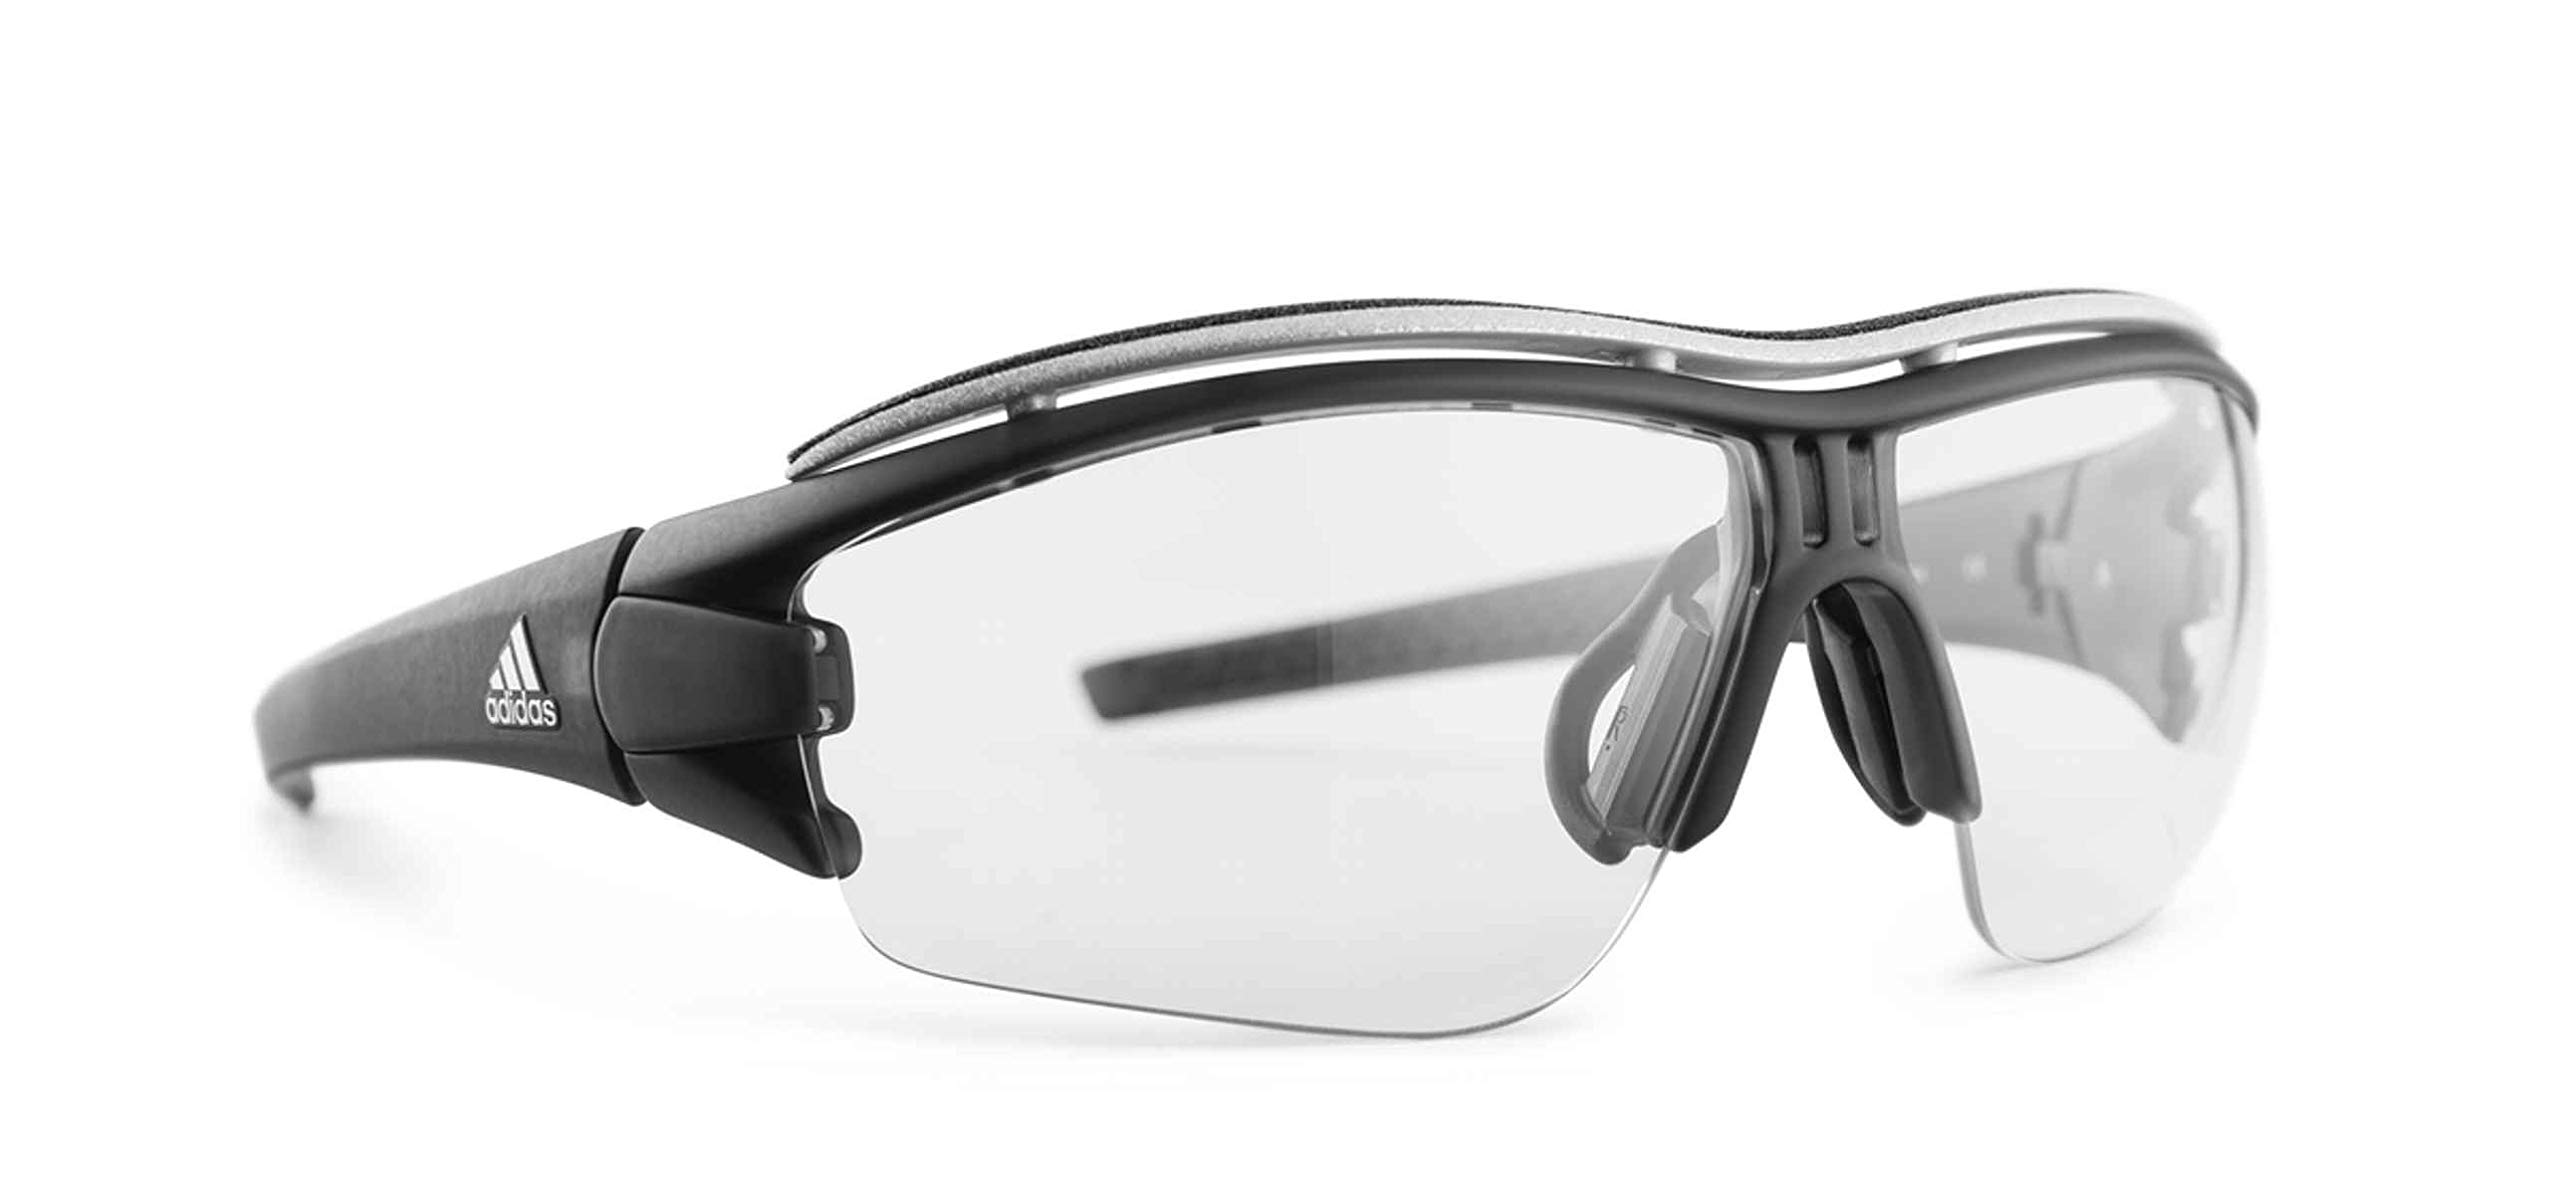 adidas Evil Eye Halfrim Pro L Sunglasses 2018 Coal Reflective Vario Antifog Clear - Gray